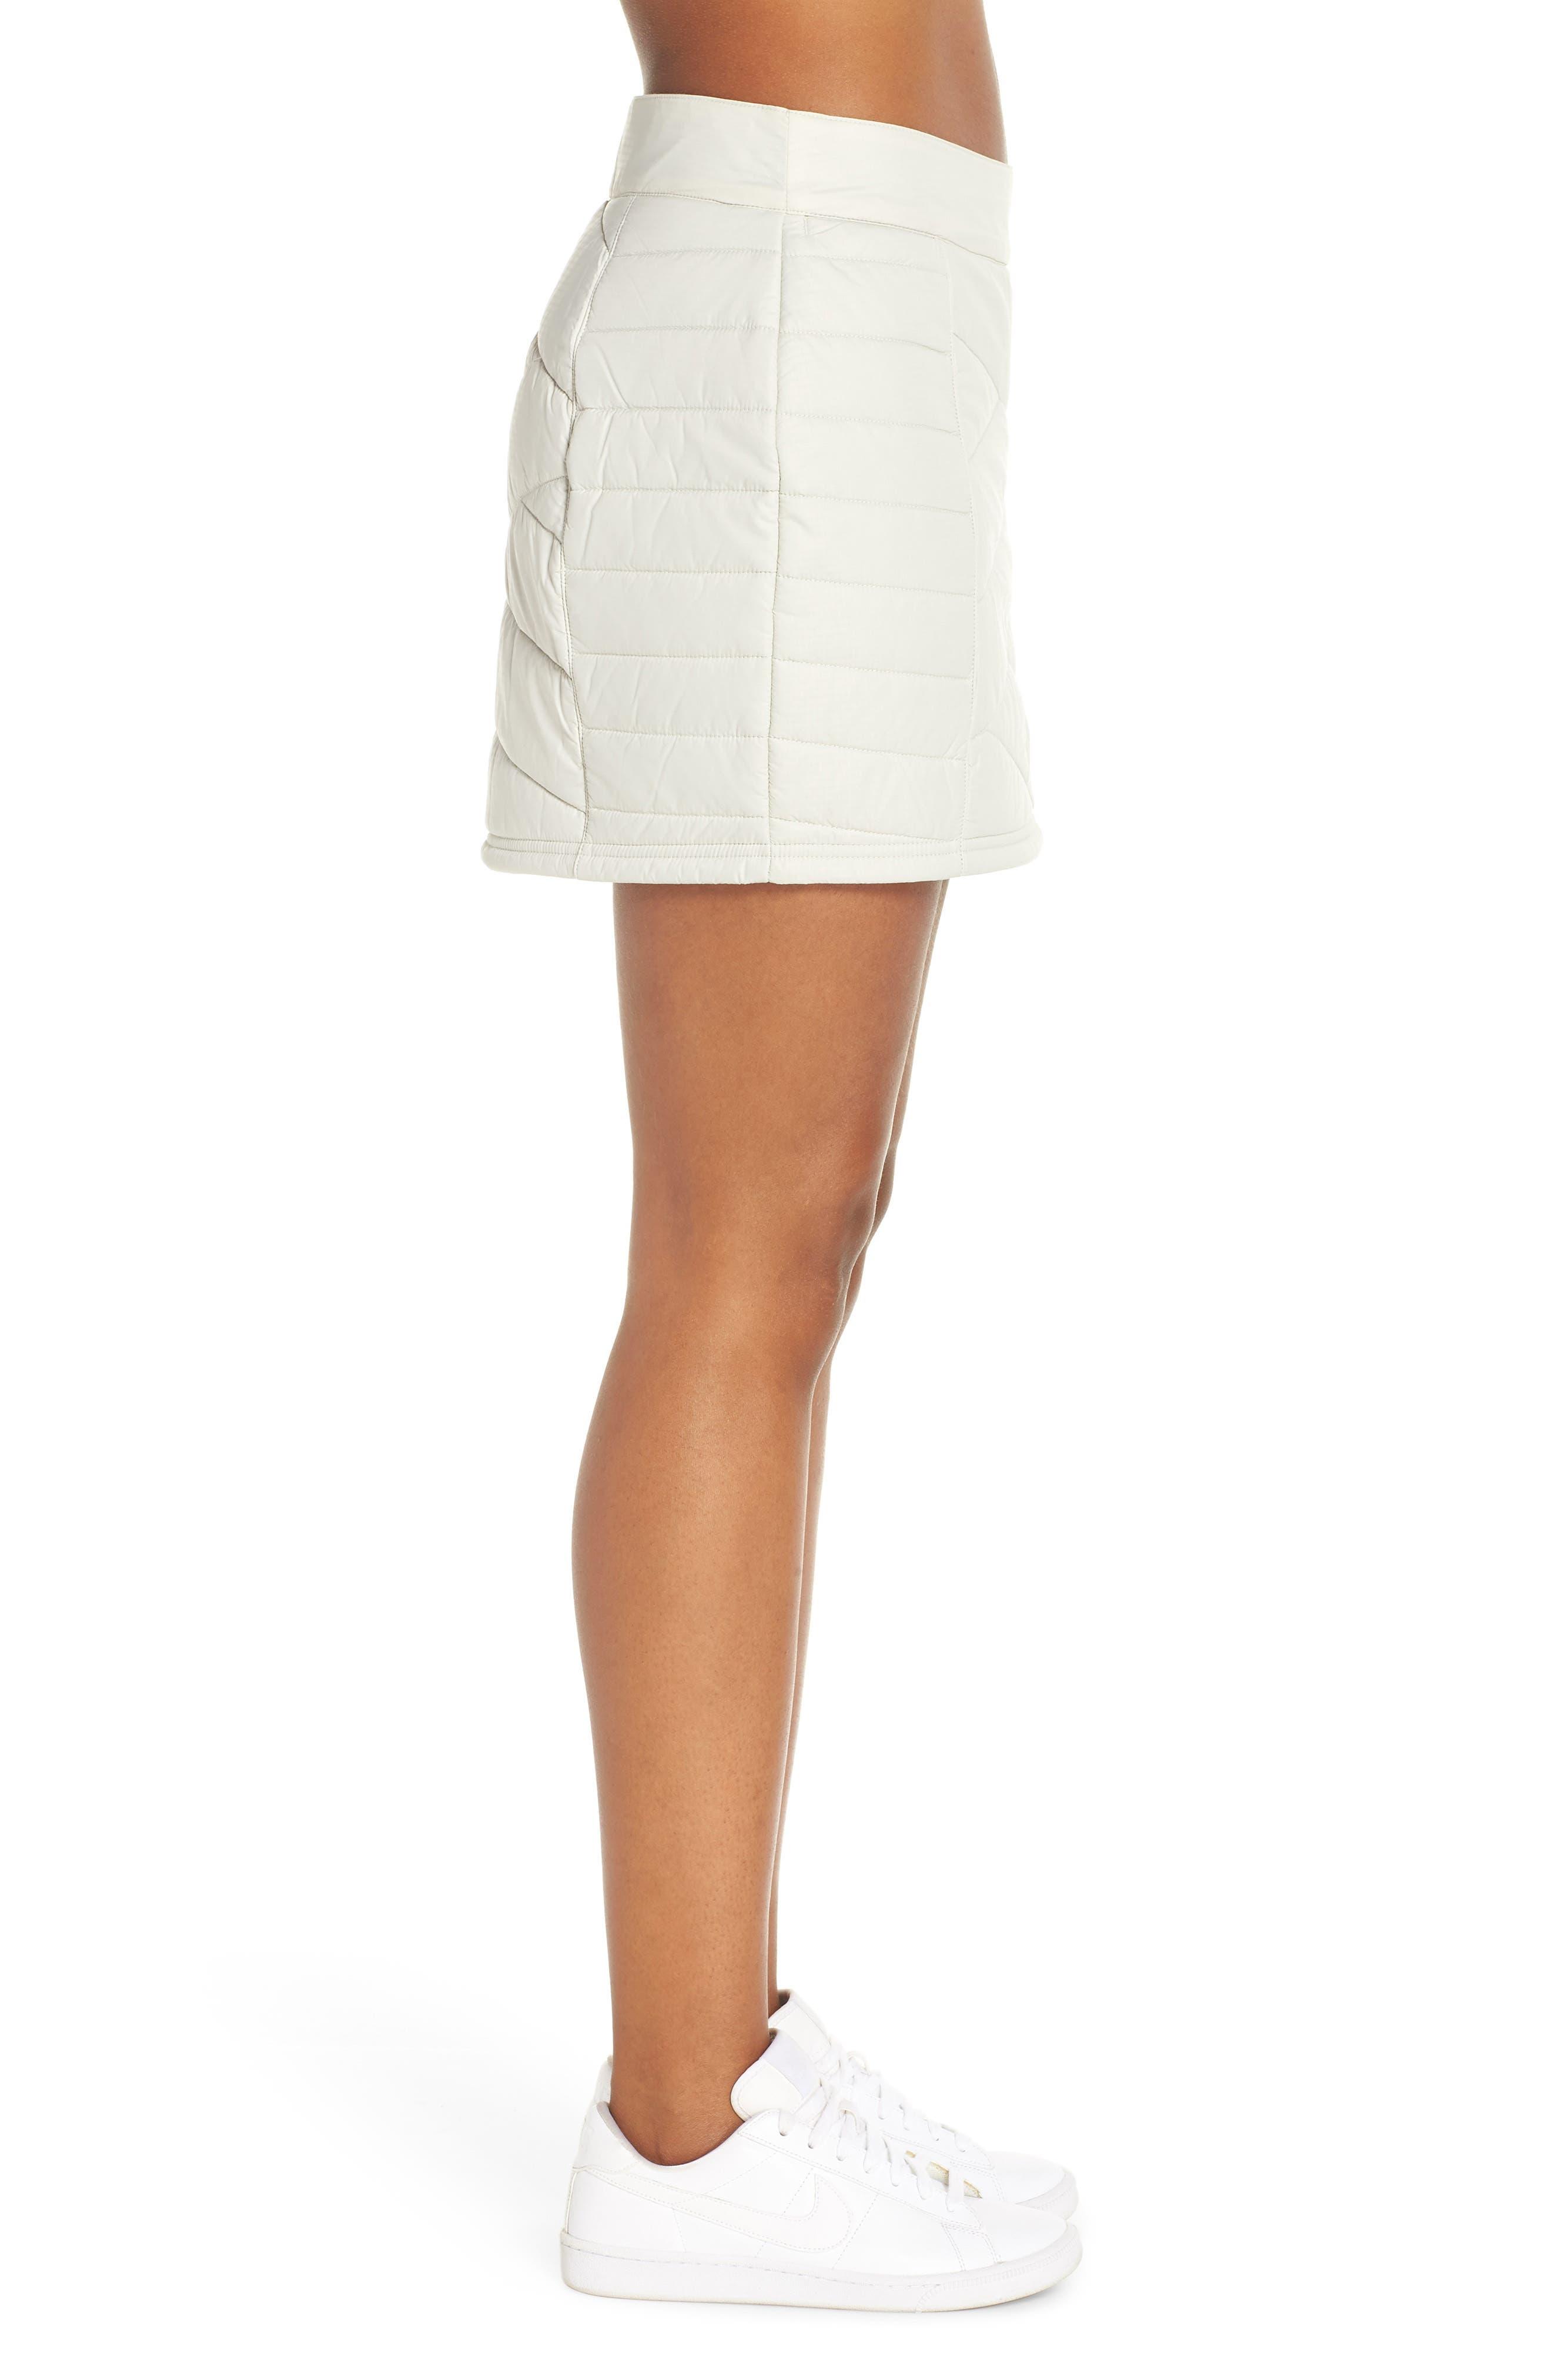 SMARTWOOL,                             Smartloft 120 Quilted Skirt,                             Alternate thumbnail 3, color,                             025